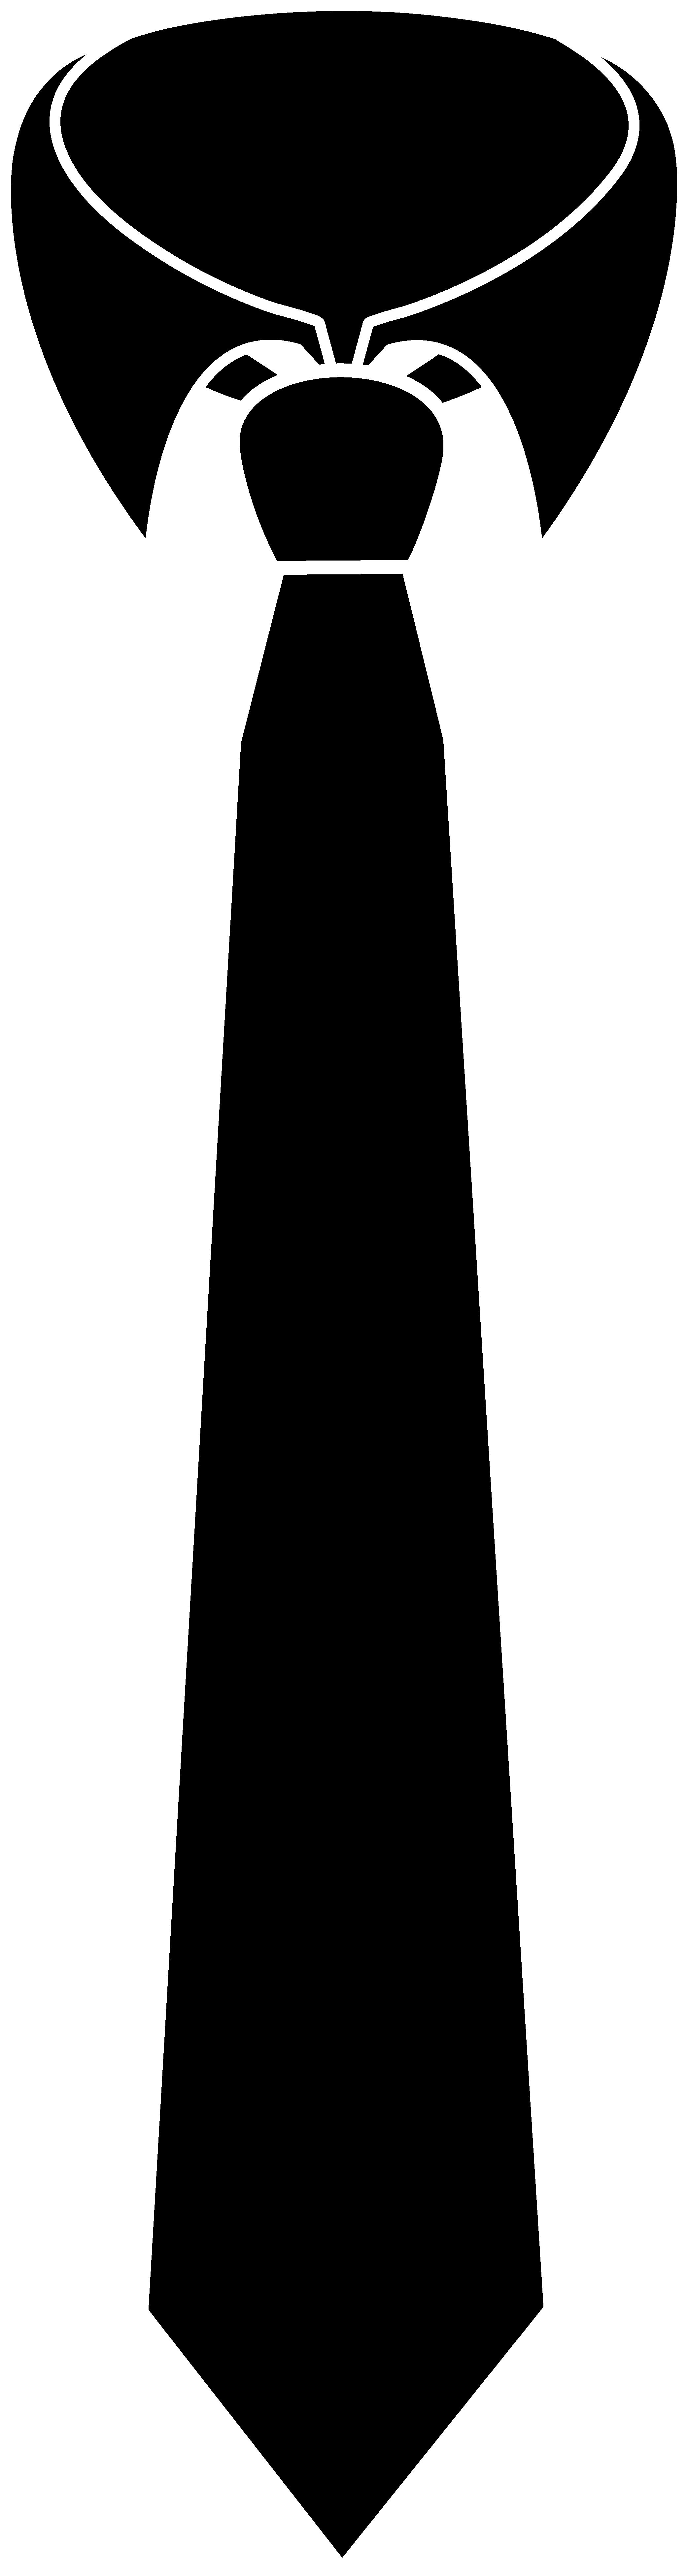 collar clipart-collar clipart-4